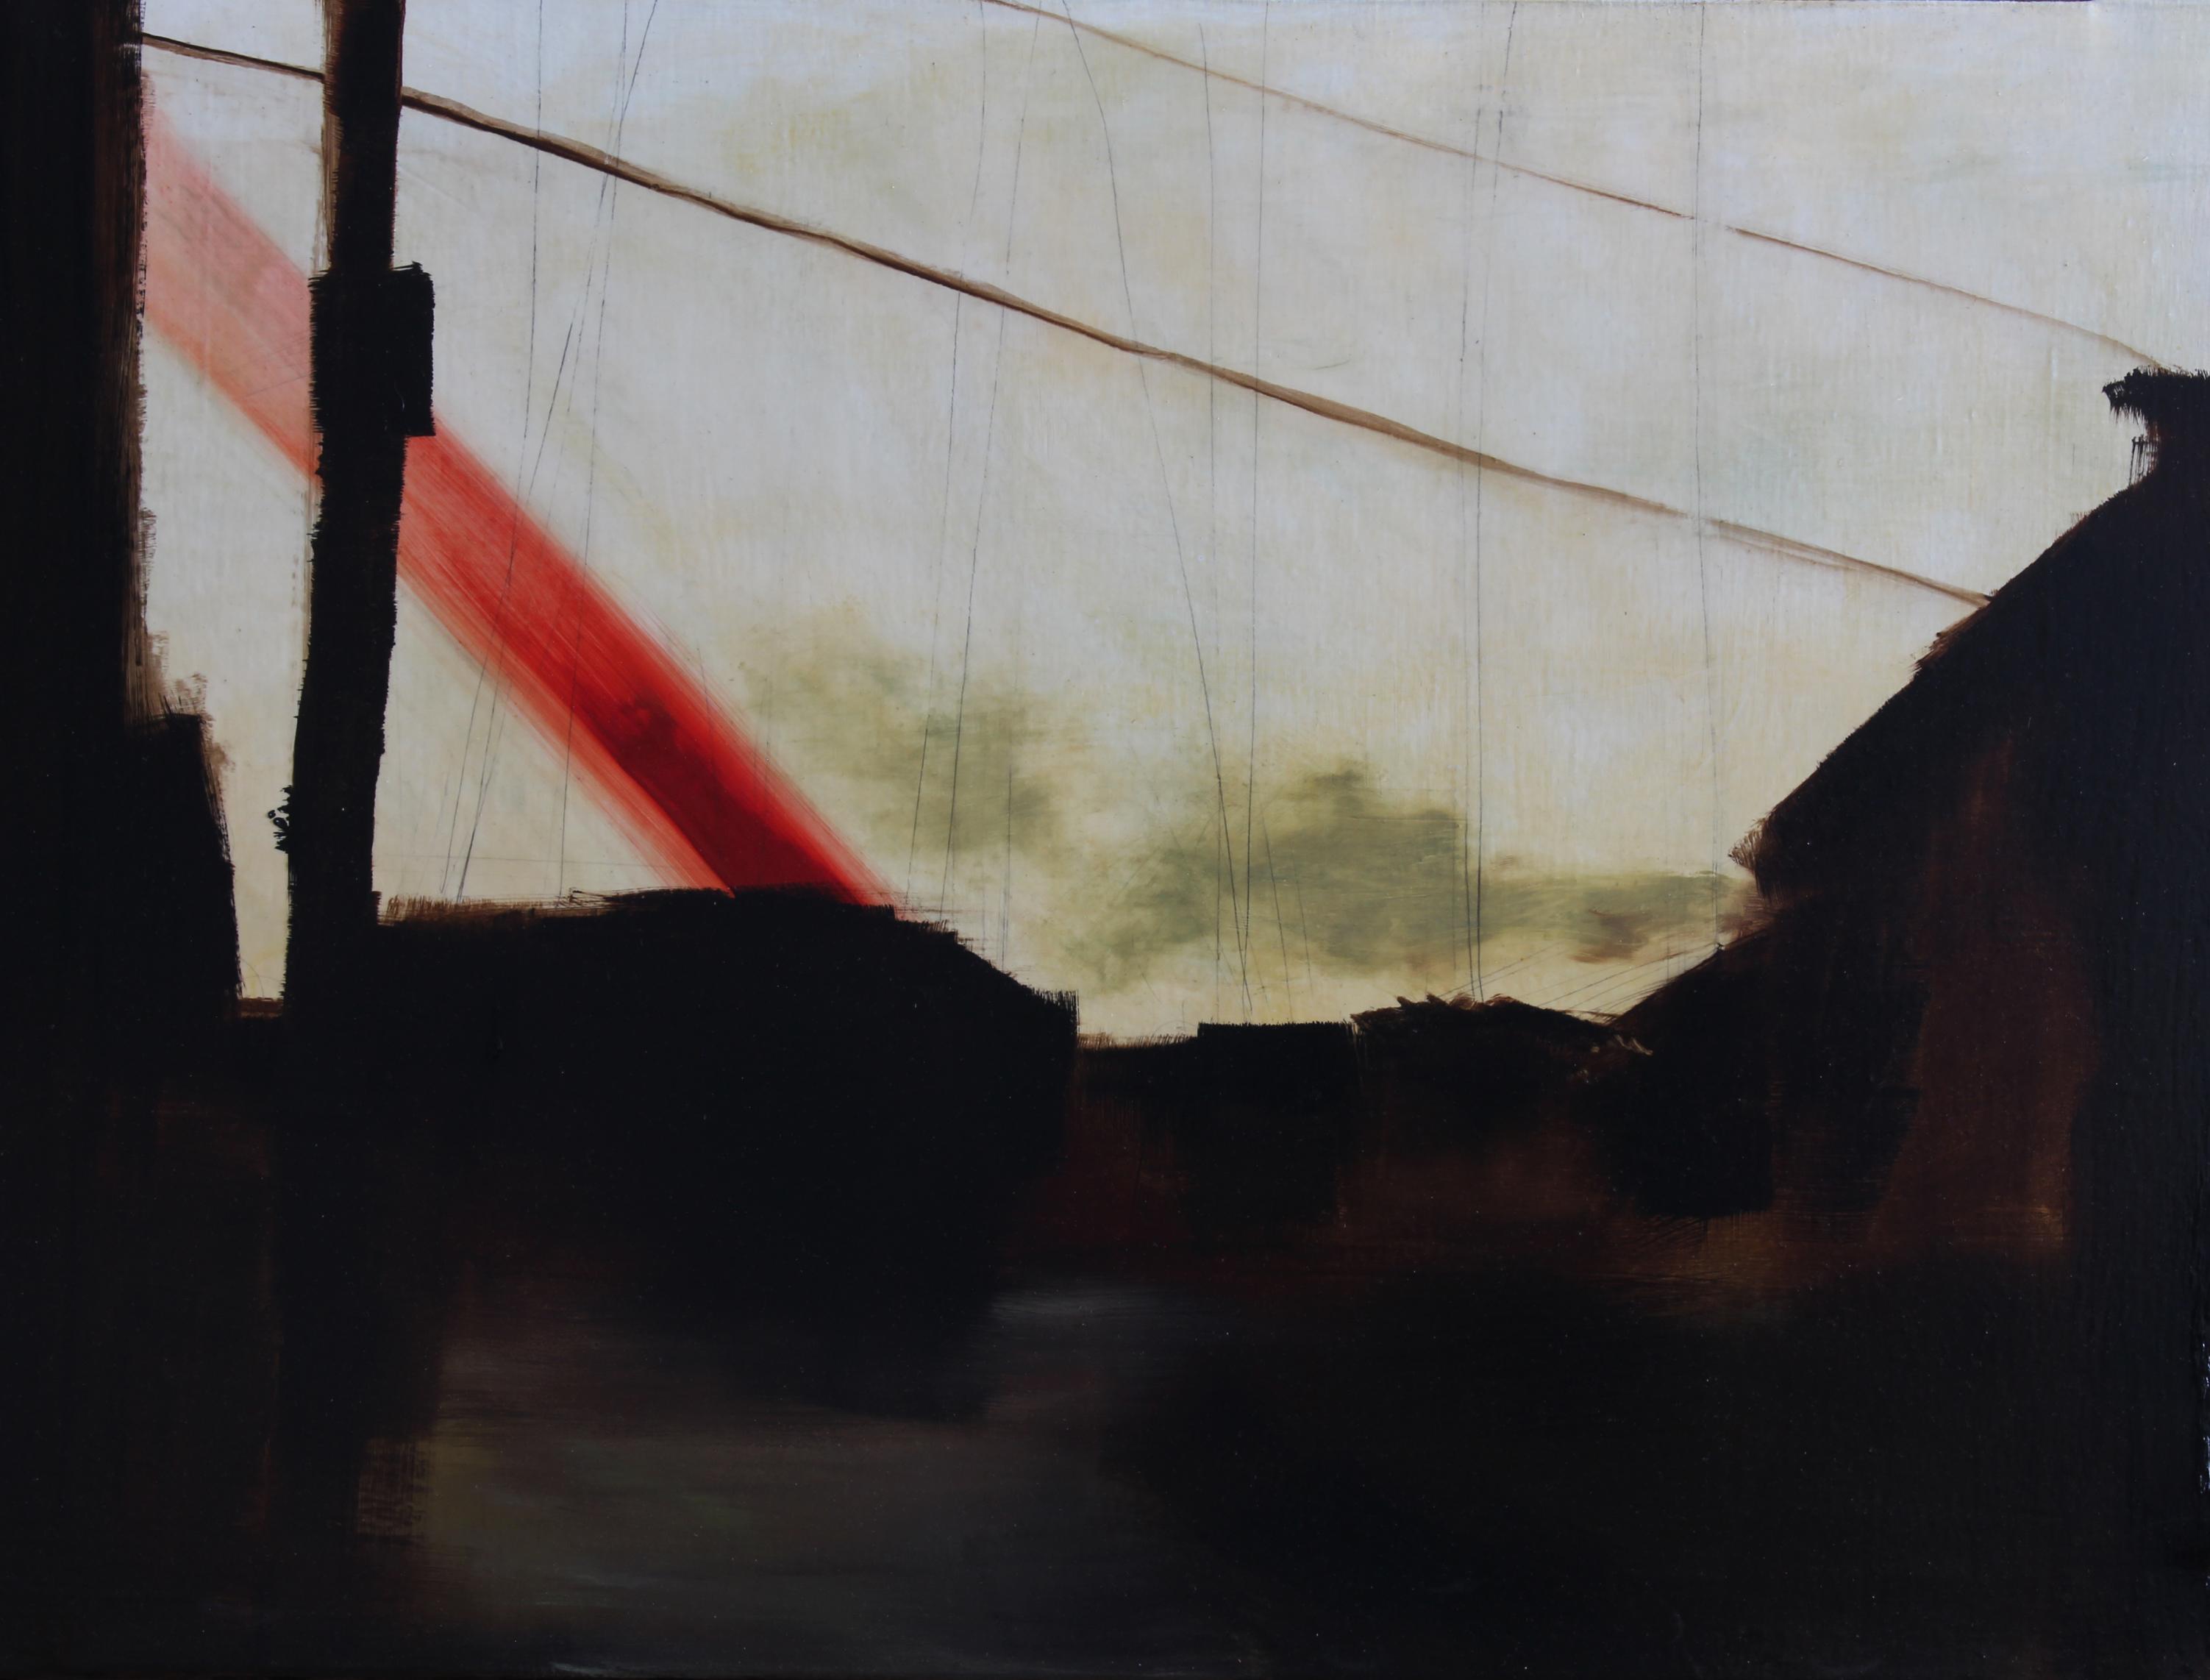 la casa del silencio (2016) - Daniel Berdala